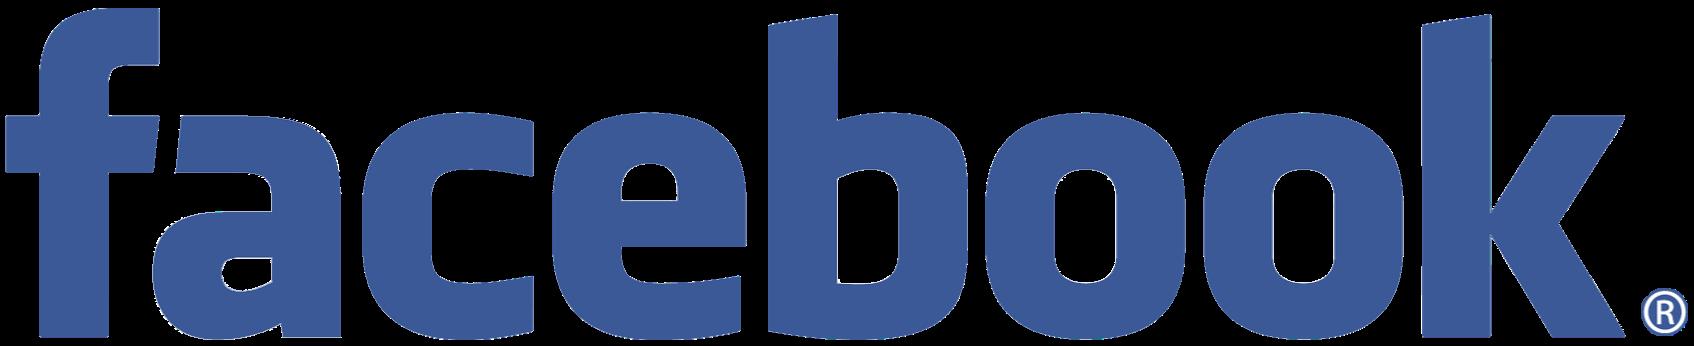 Facebook clipart lik. Word clip art vector